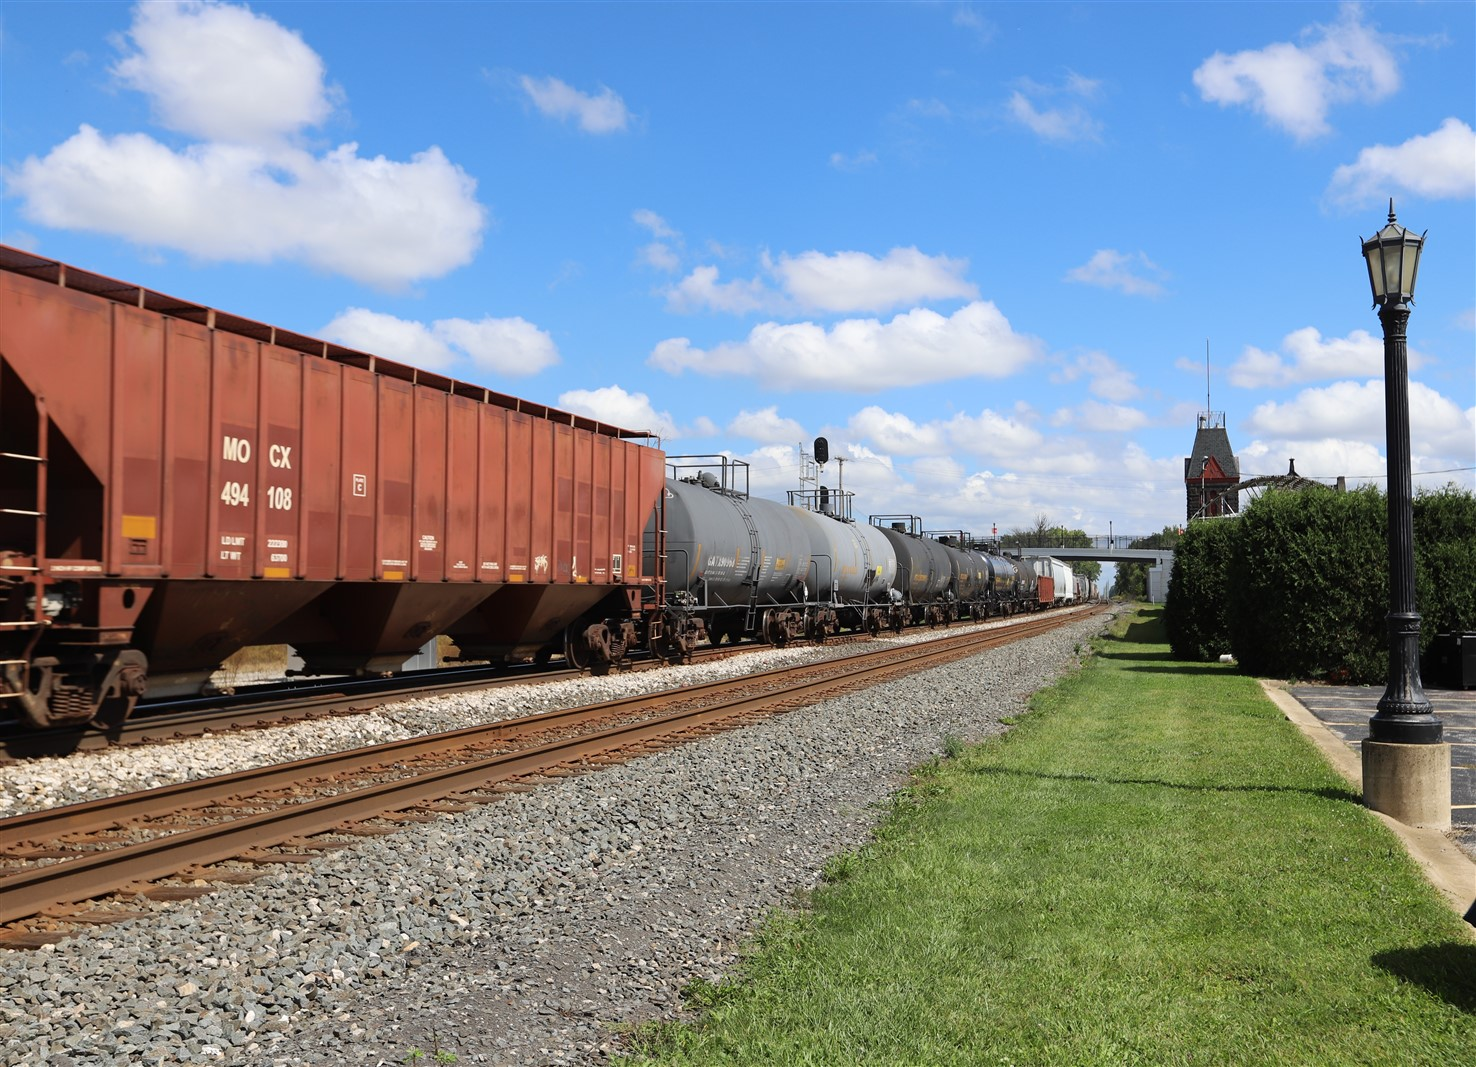 2018 09 15 16 Olmstead Falls OH Depot.jpg